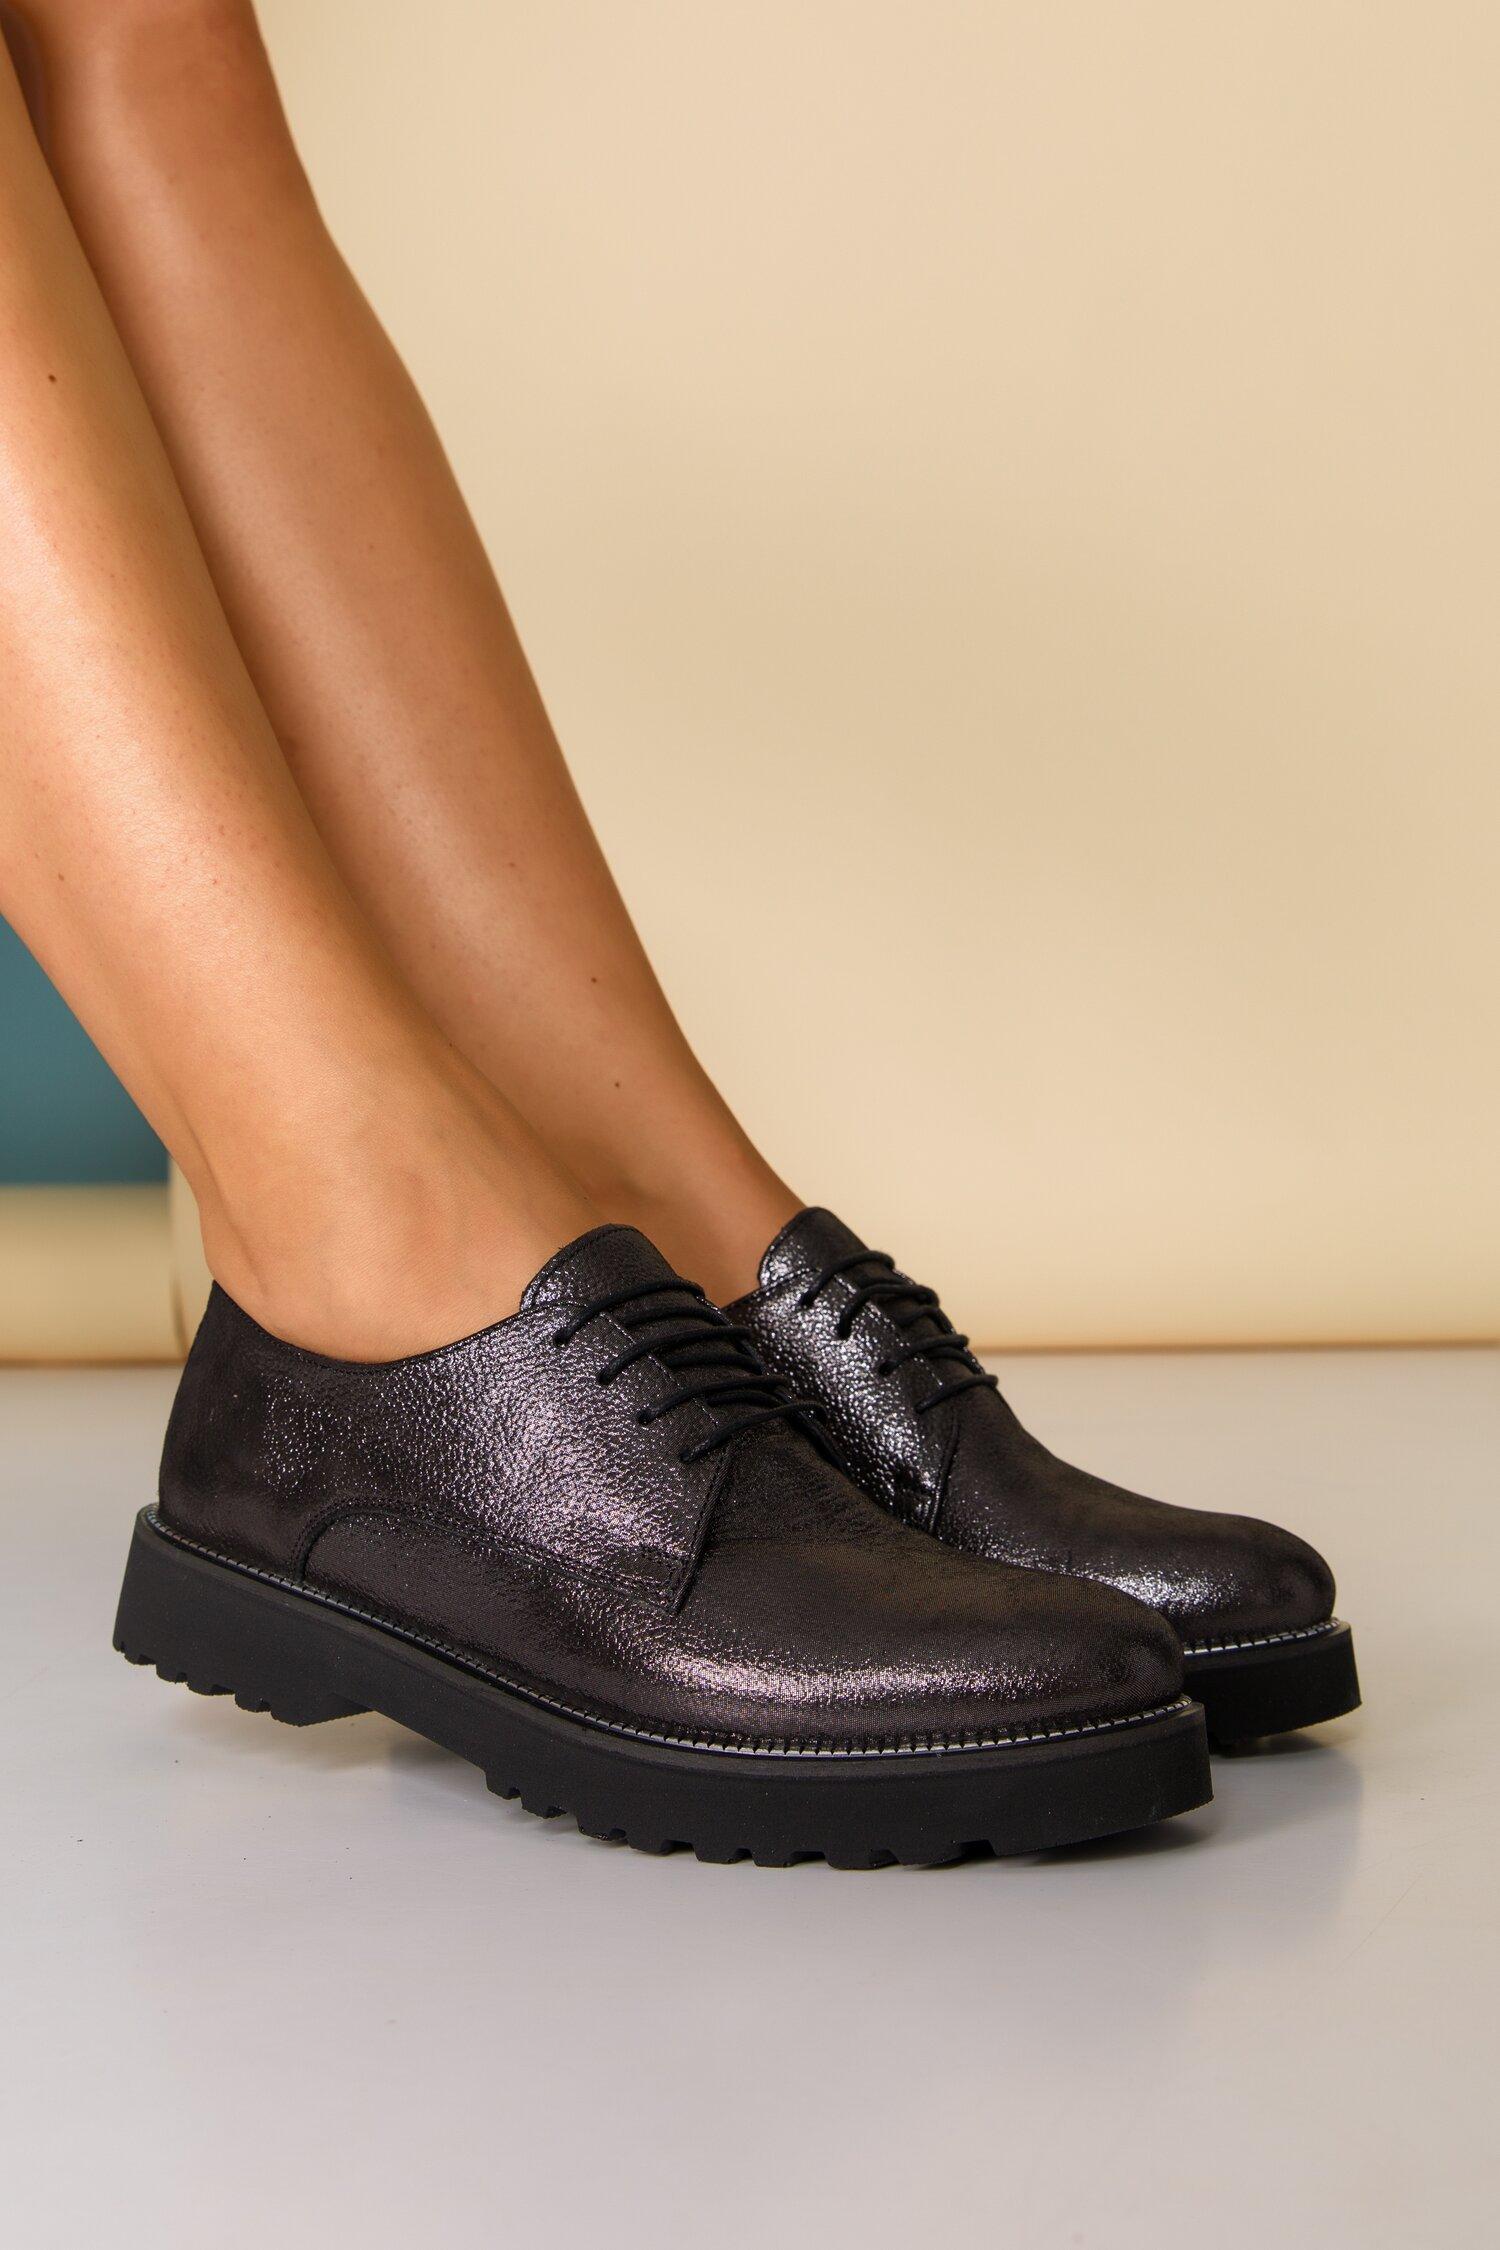 Pantofi Oxford negri sidefat cu sireturi imagine